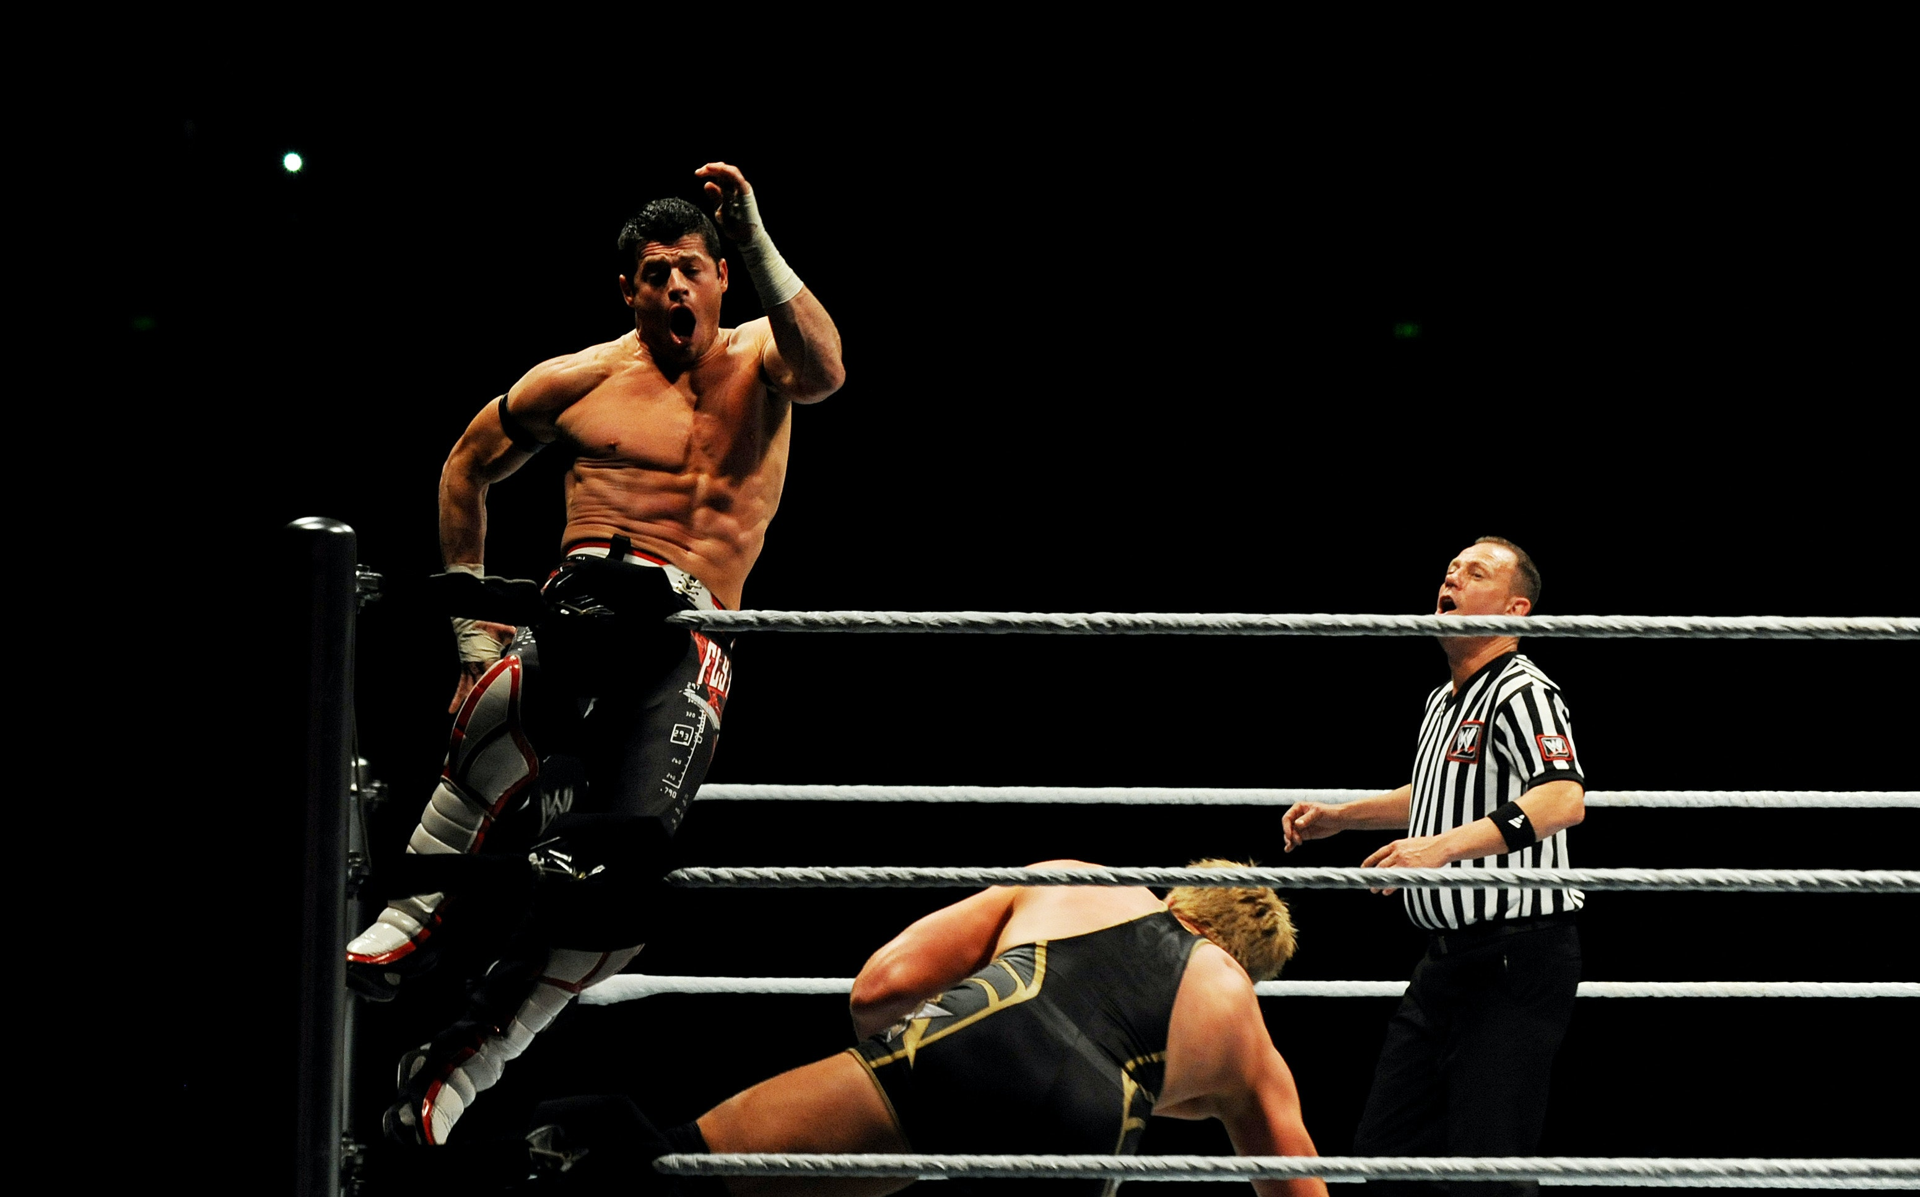 Pro wrestling brisbane